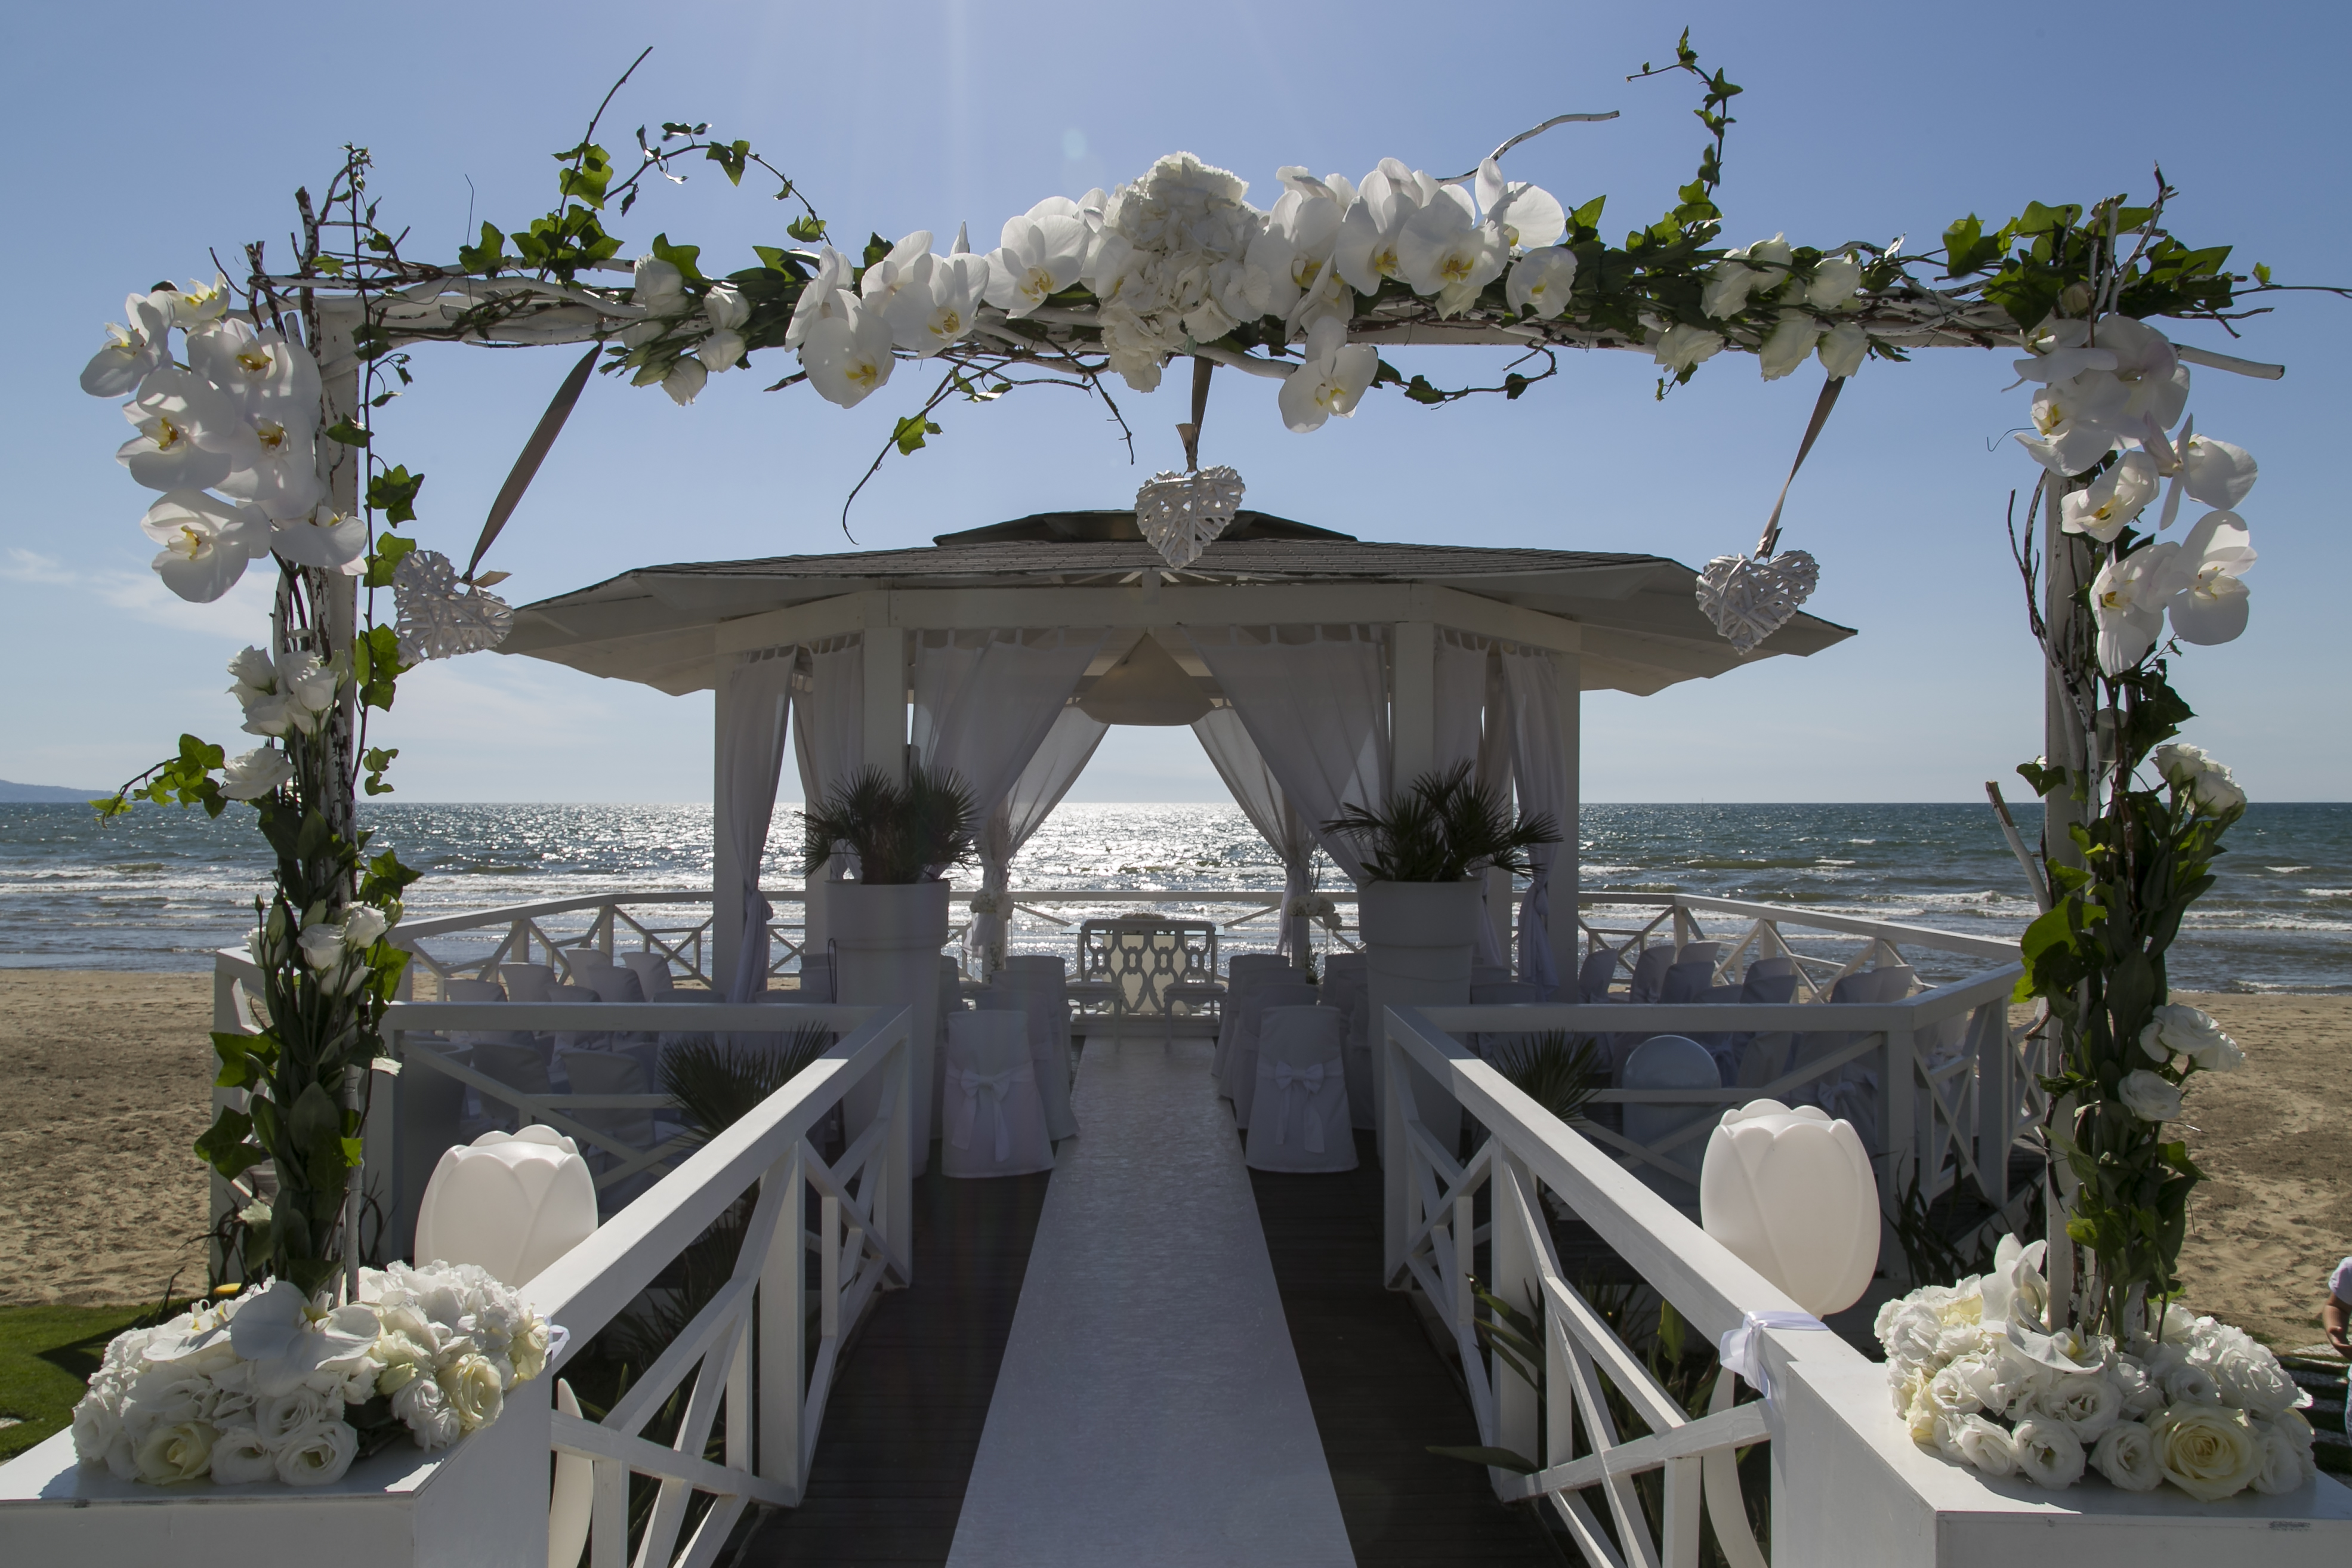 Matrimoni Vip Spiaggia : Matrimoni in spiaggia sohal beach per le tue nozze